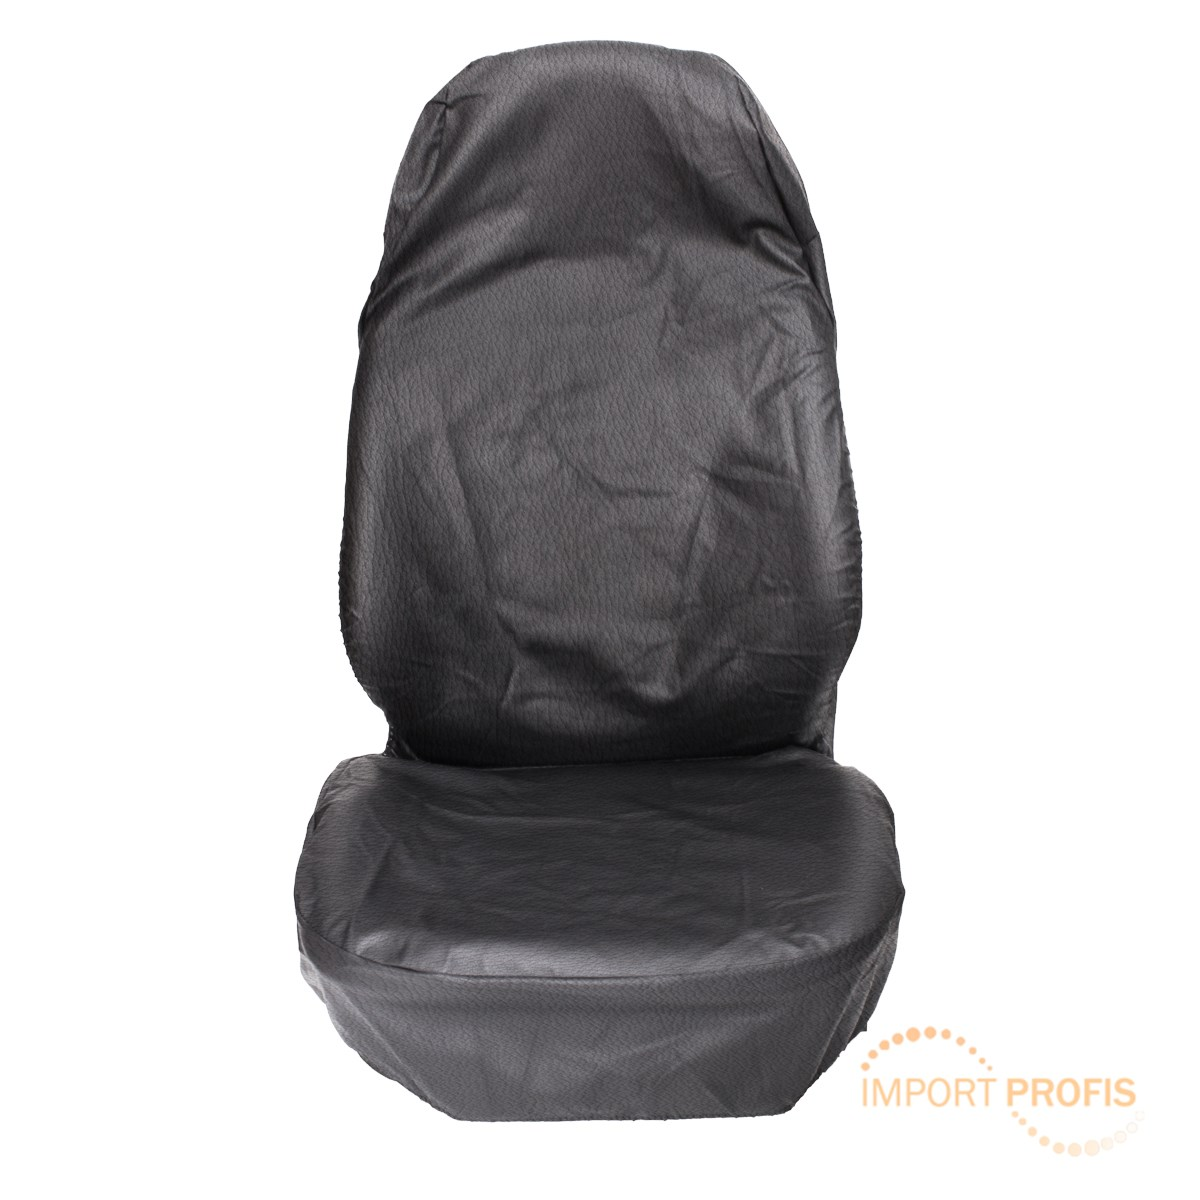 werkstattschoner kunstleder werkstatt sitzbezug schonbezug sitzschoner auto ebay. Black Bedroom Furniture Sets. Home Design Ideas